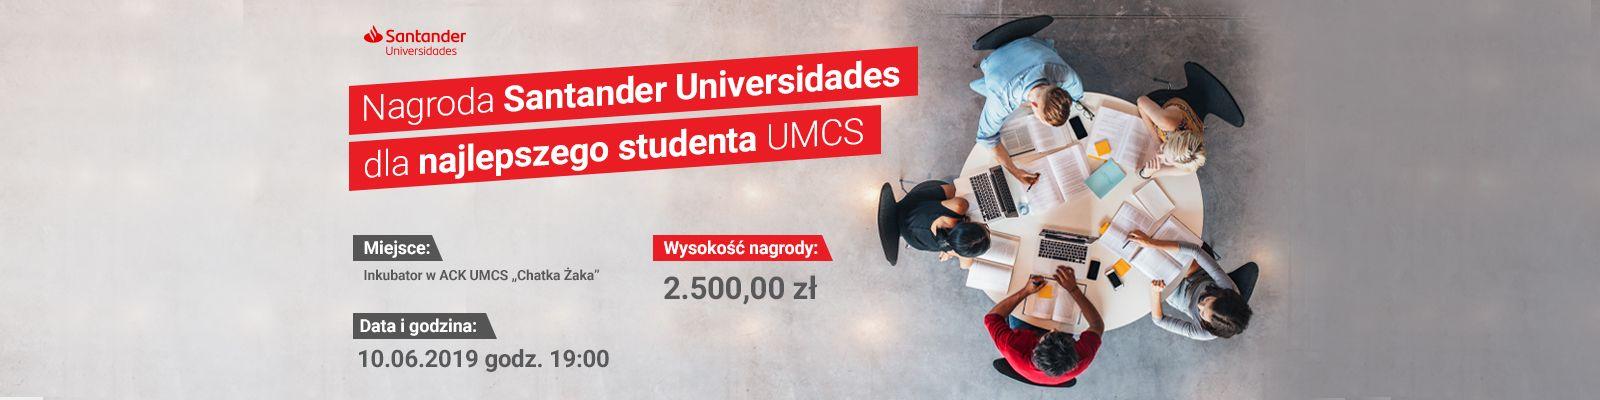 Nagroda Santander Universidades dla najlepszego studenta...